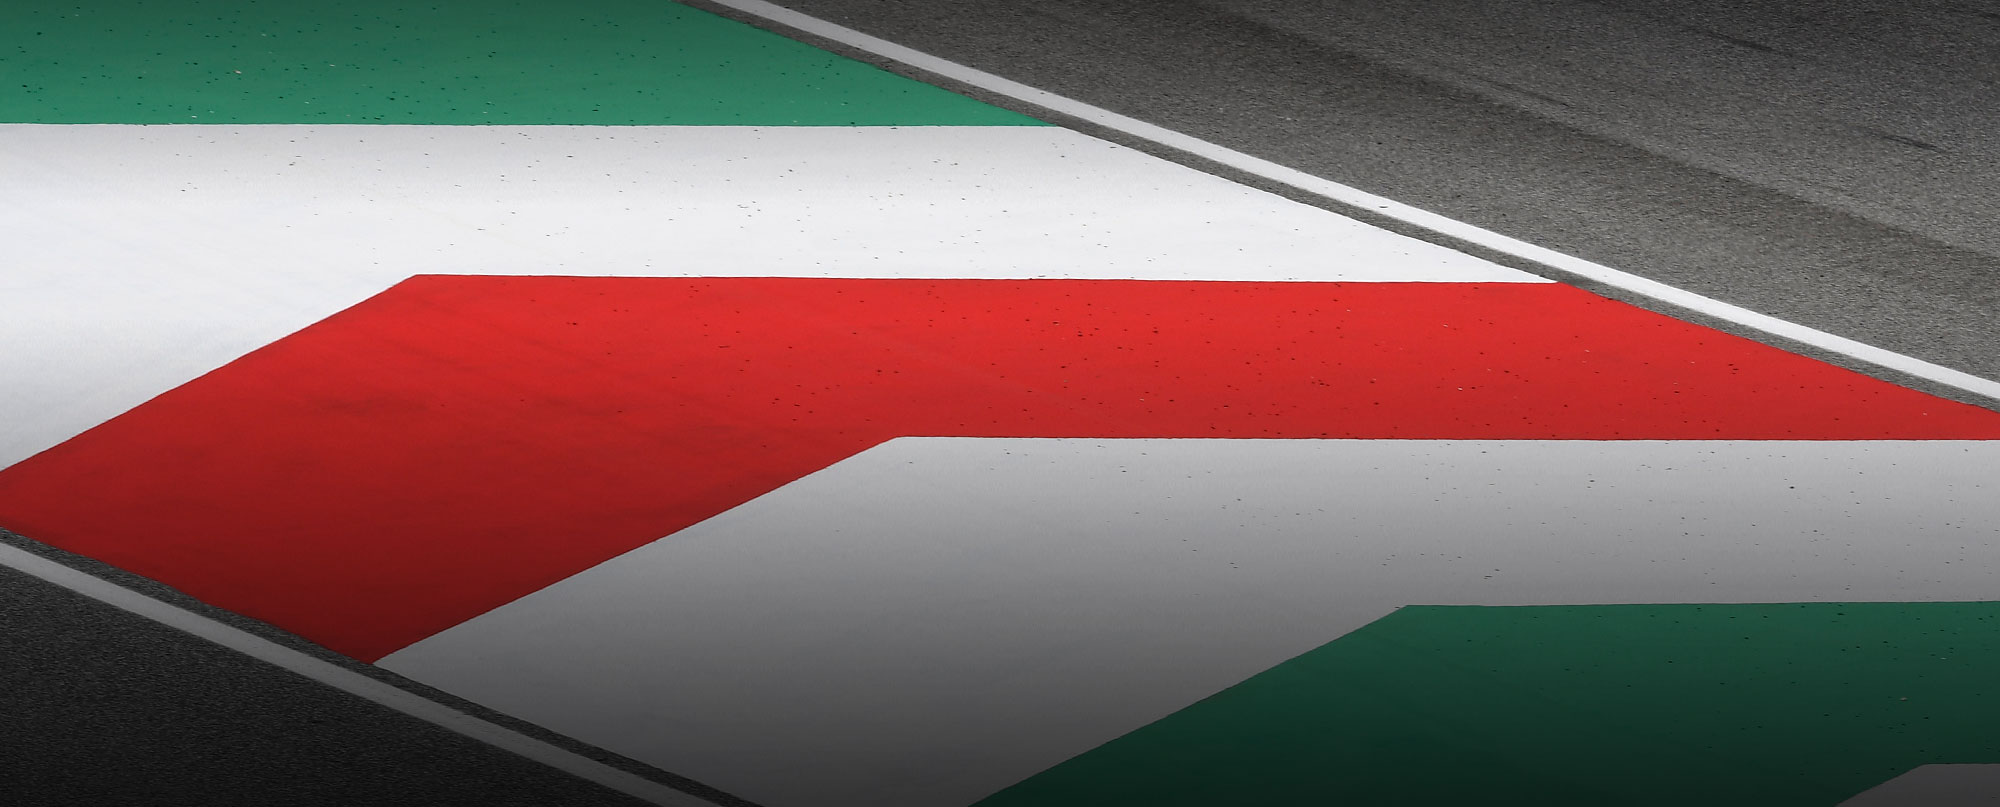 Grand Prix of Italy